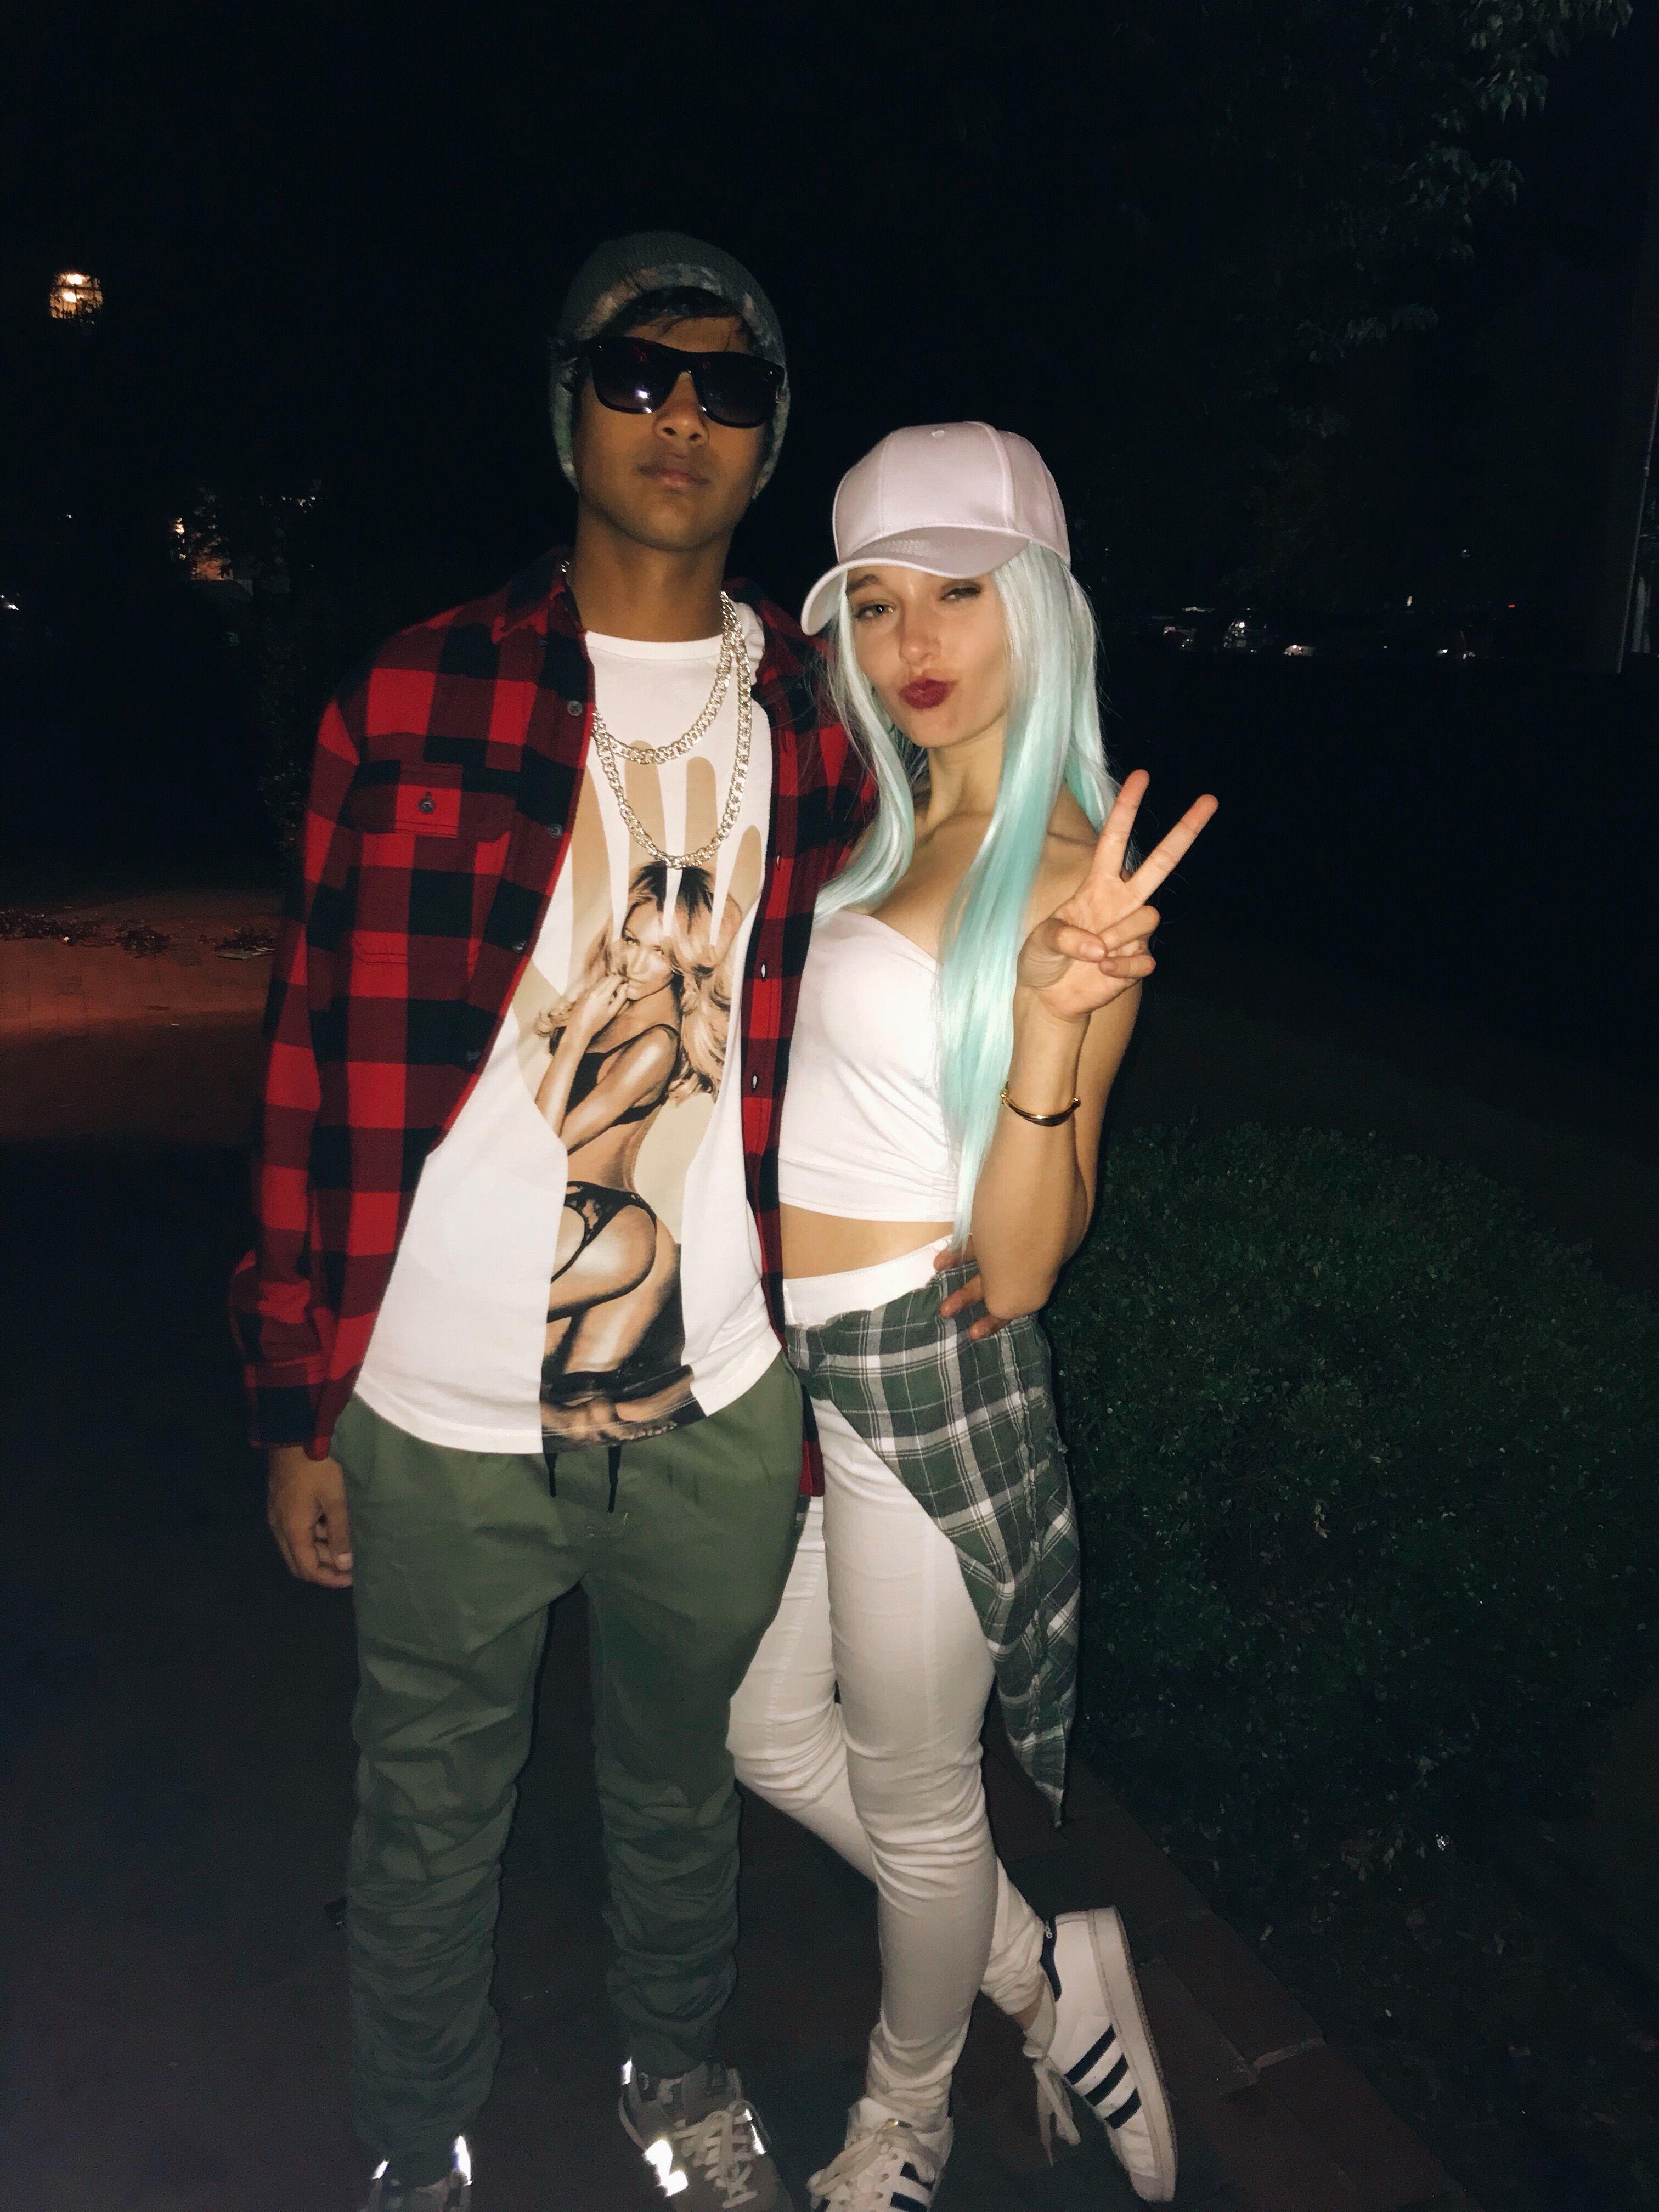 Couples Halloween costume ideas — Travis Scott & Kylie